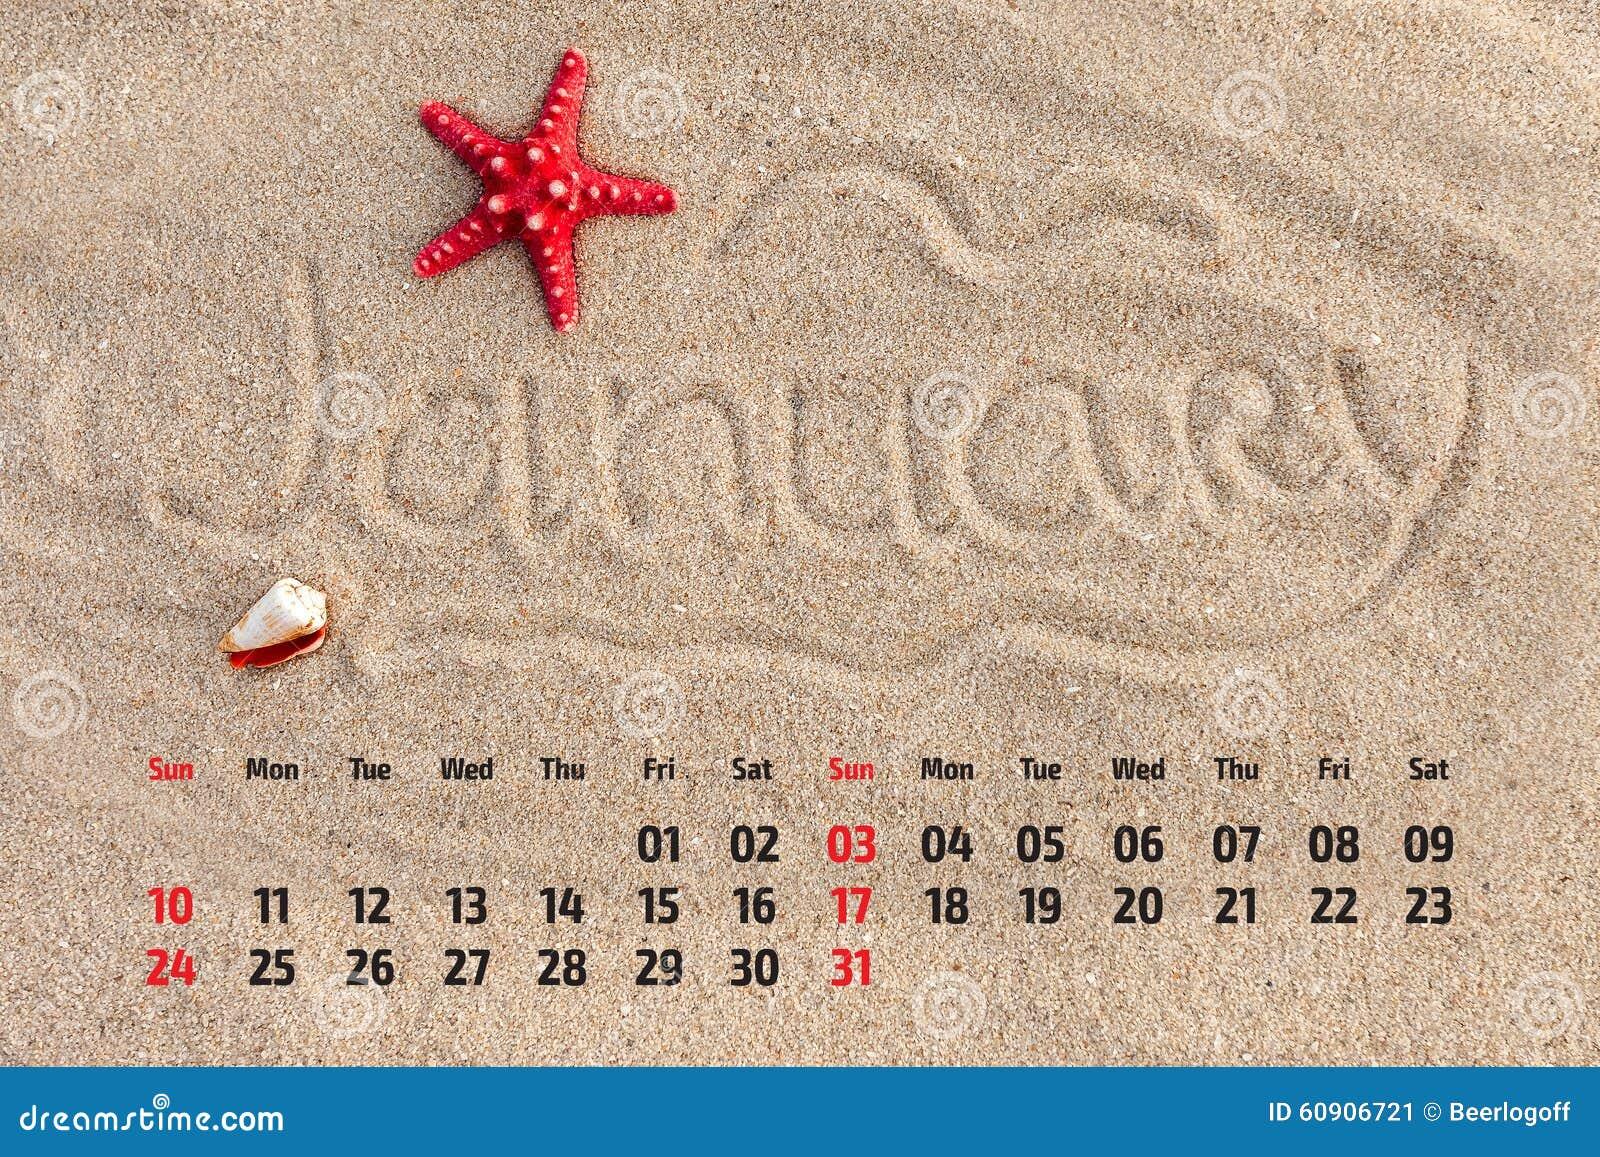 ... calendar with starfish and seashells on sand beach. January 2016